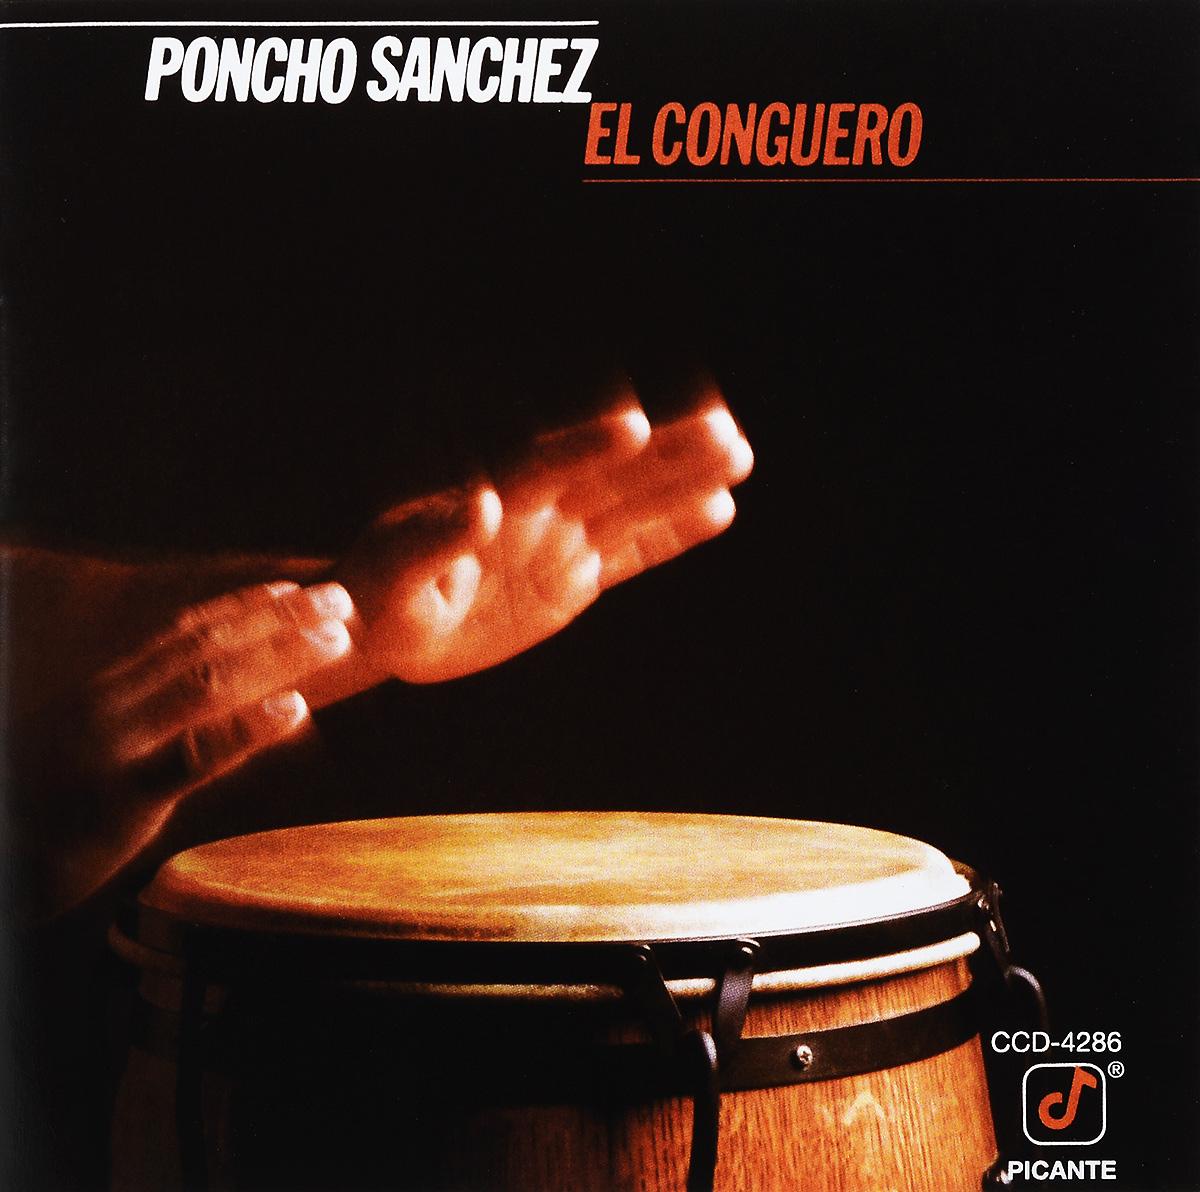 Пончо Санчез Poncho Sanchez. El Conguero